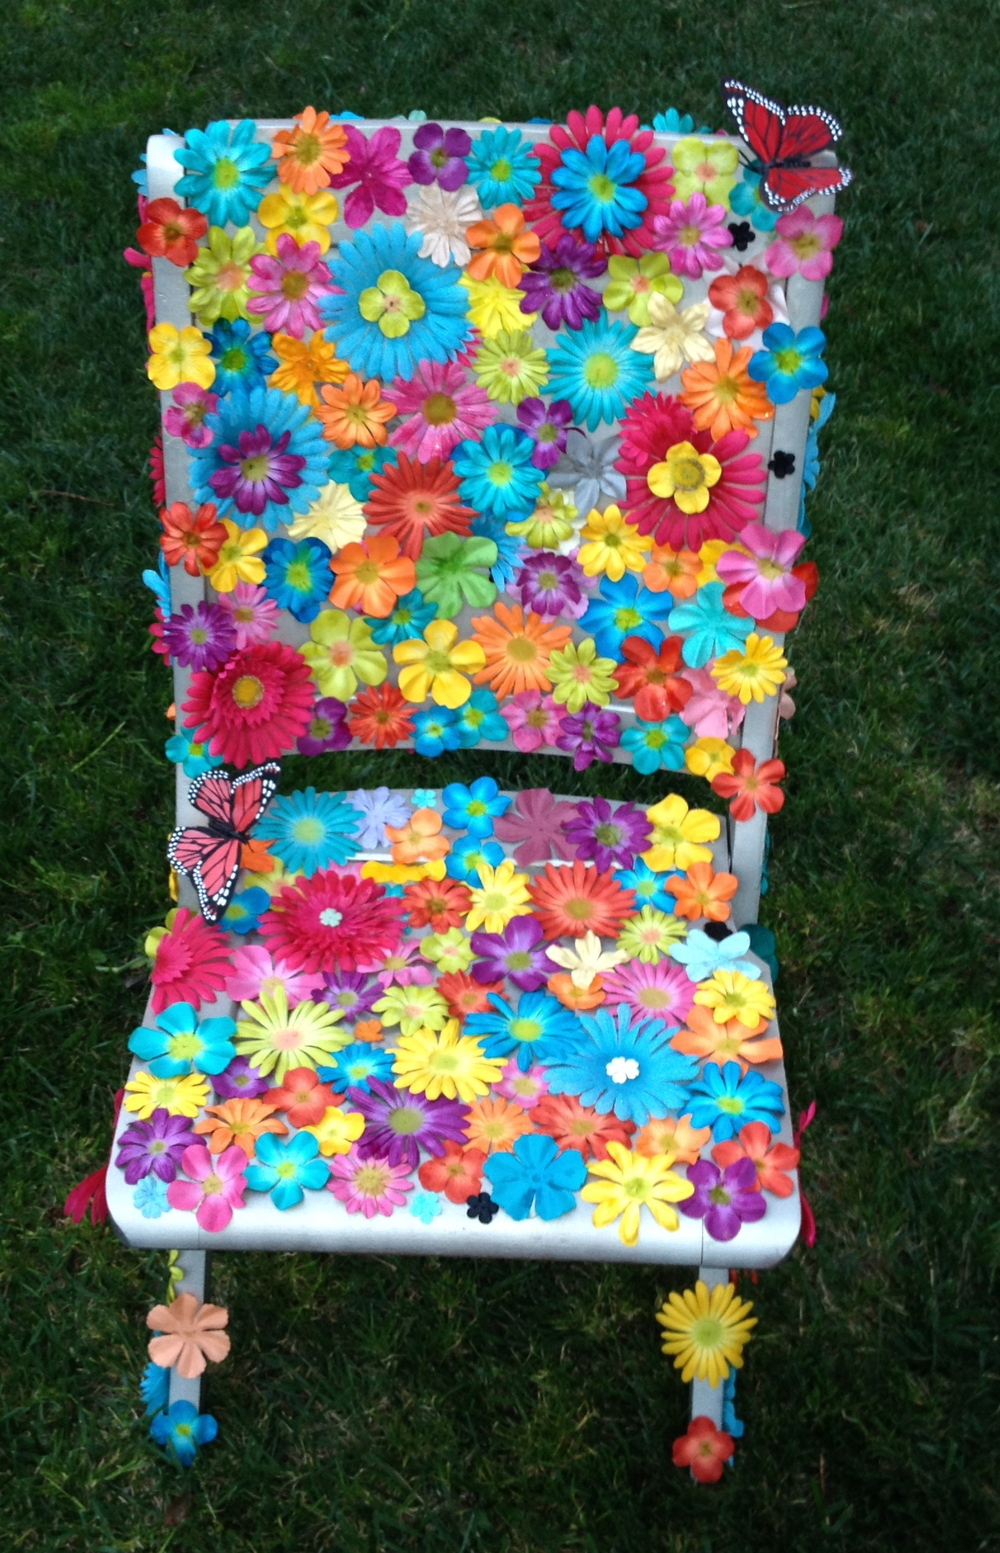 Chair # 46 Merritt Grooms